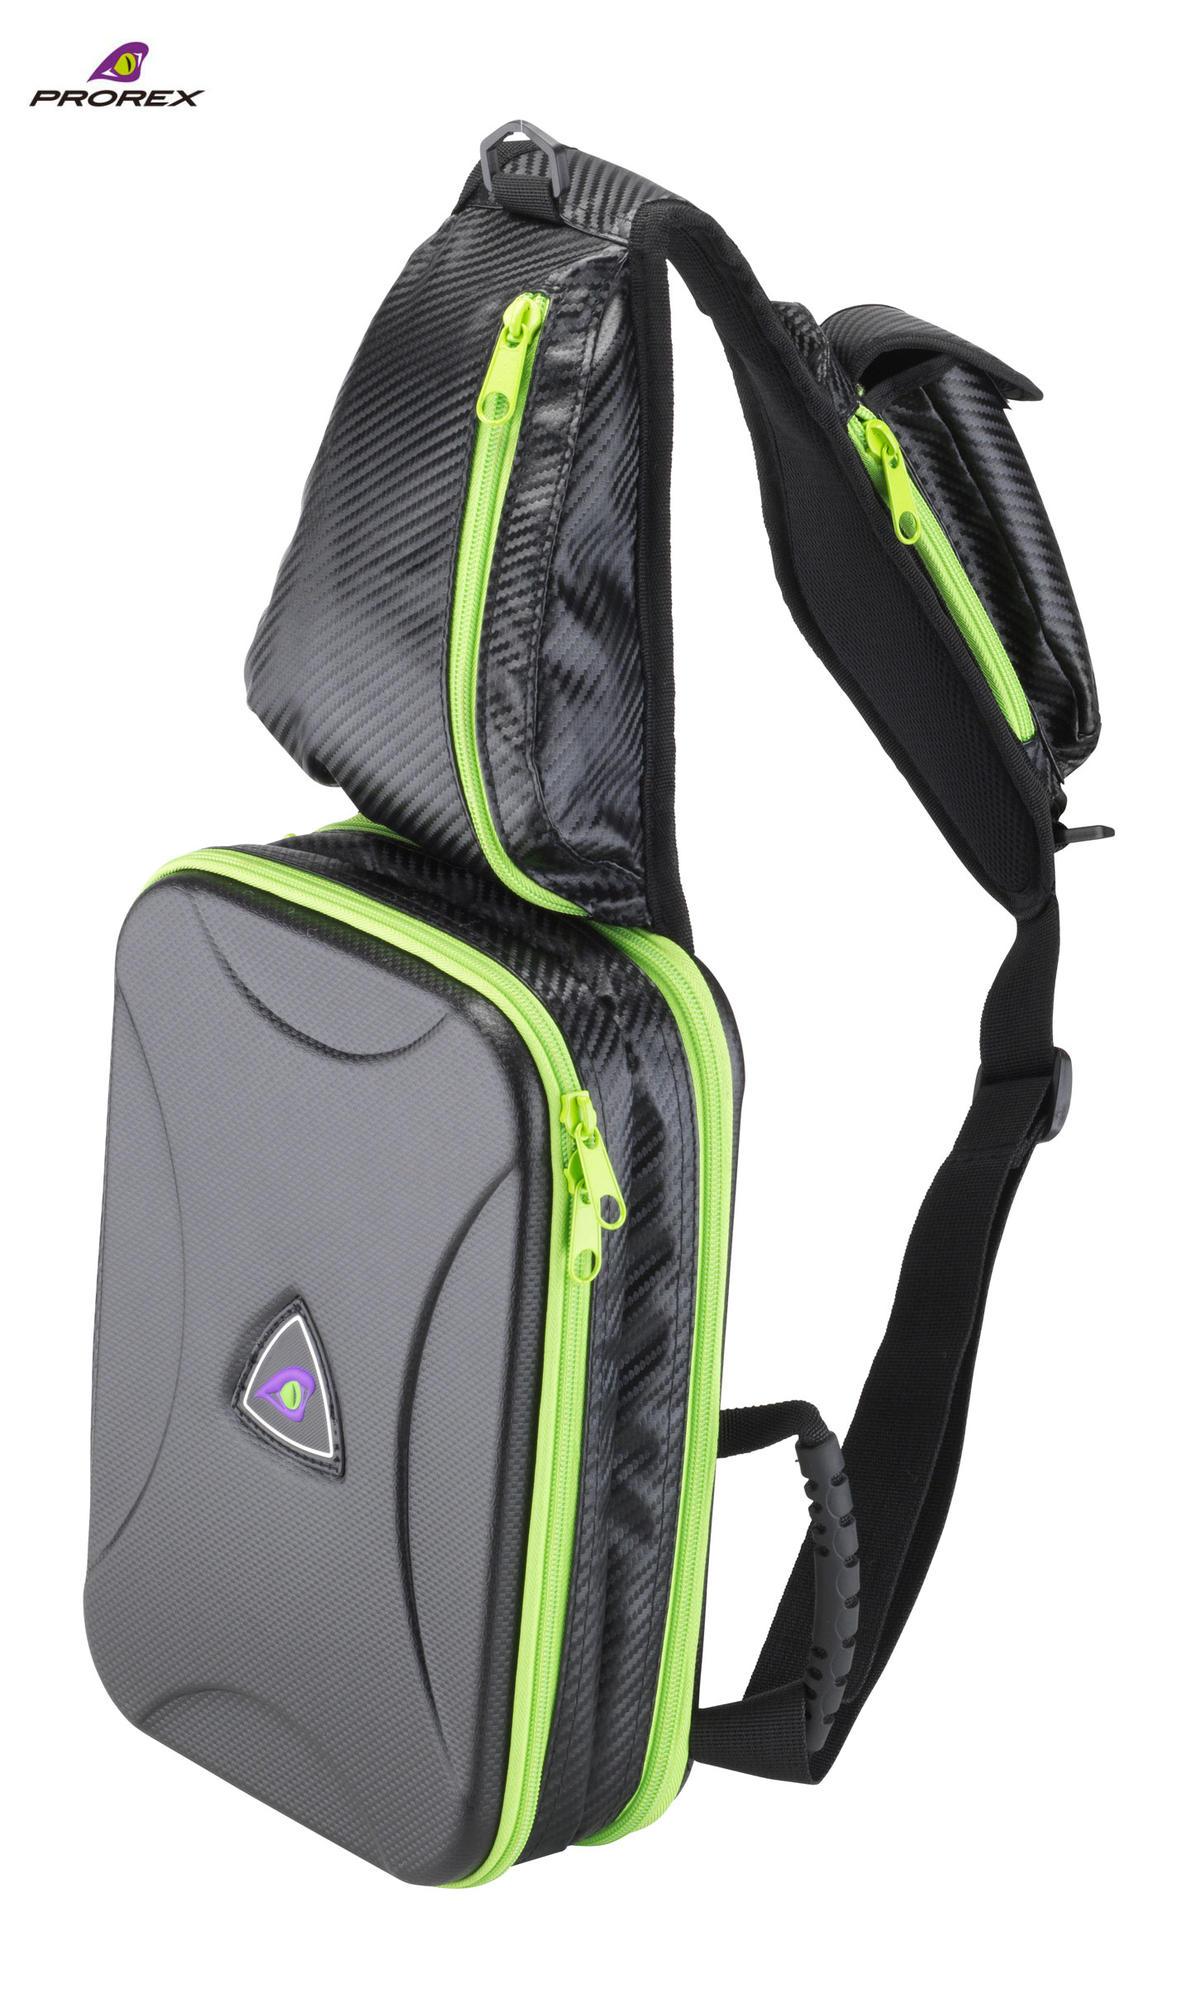 New Daiwa Prorex Roving Shoulder Bag - Pike / Predator - 15809-510